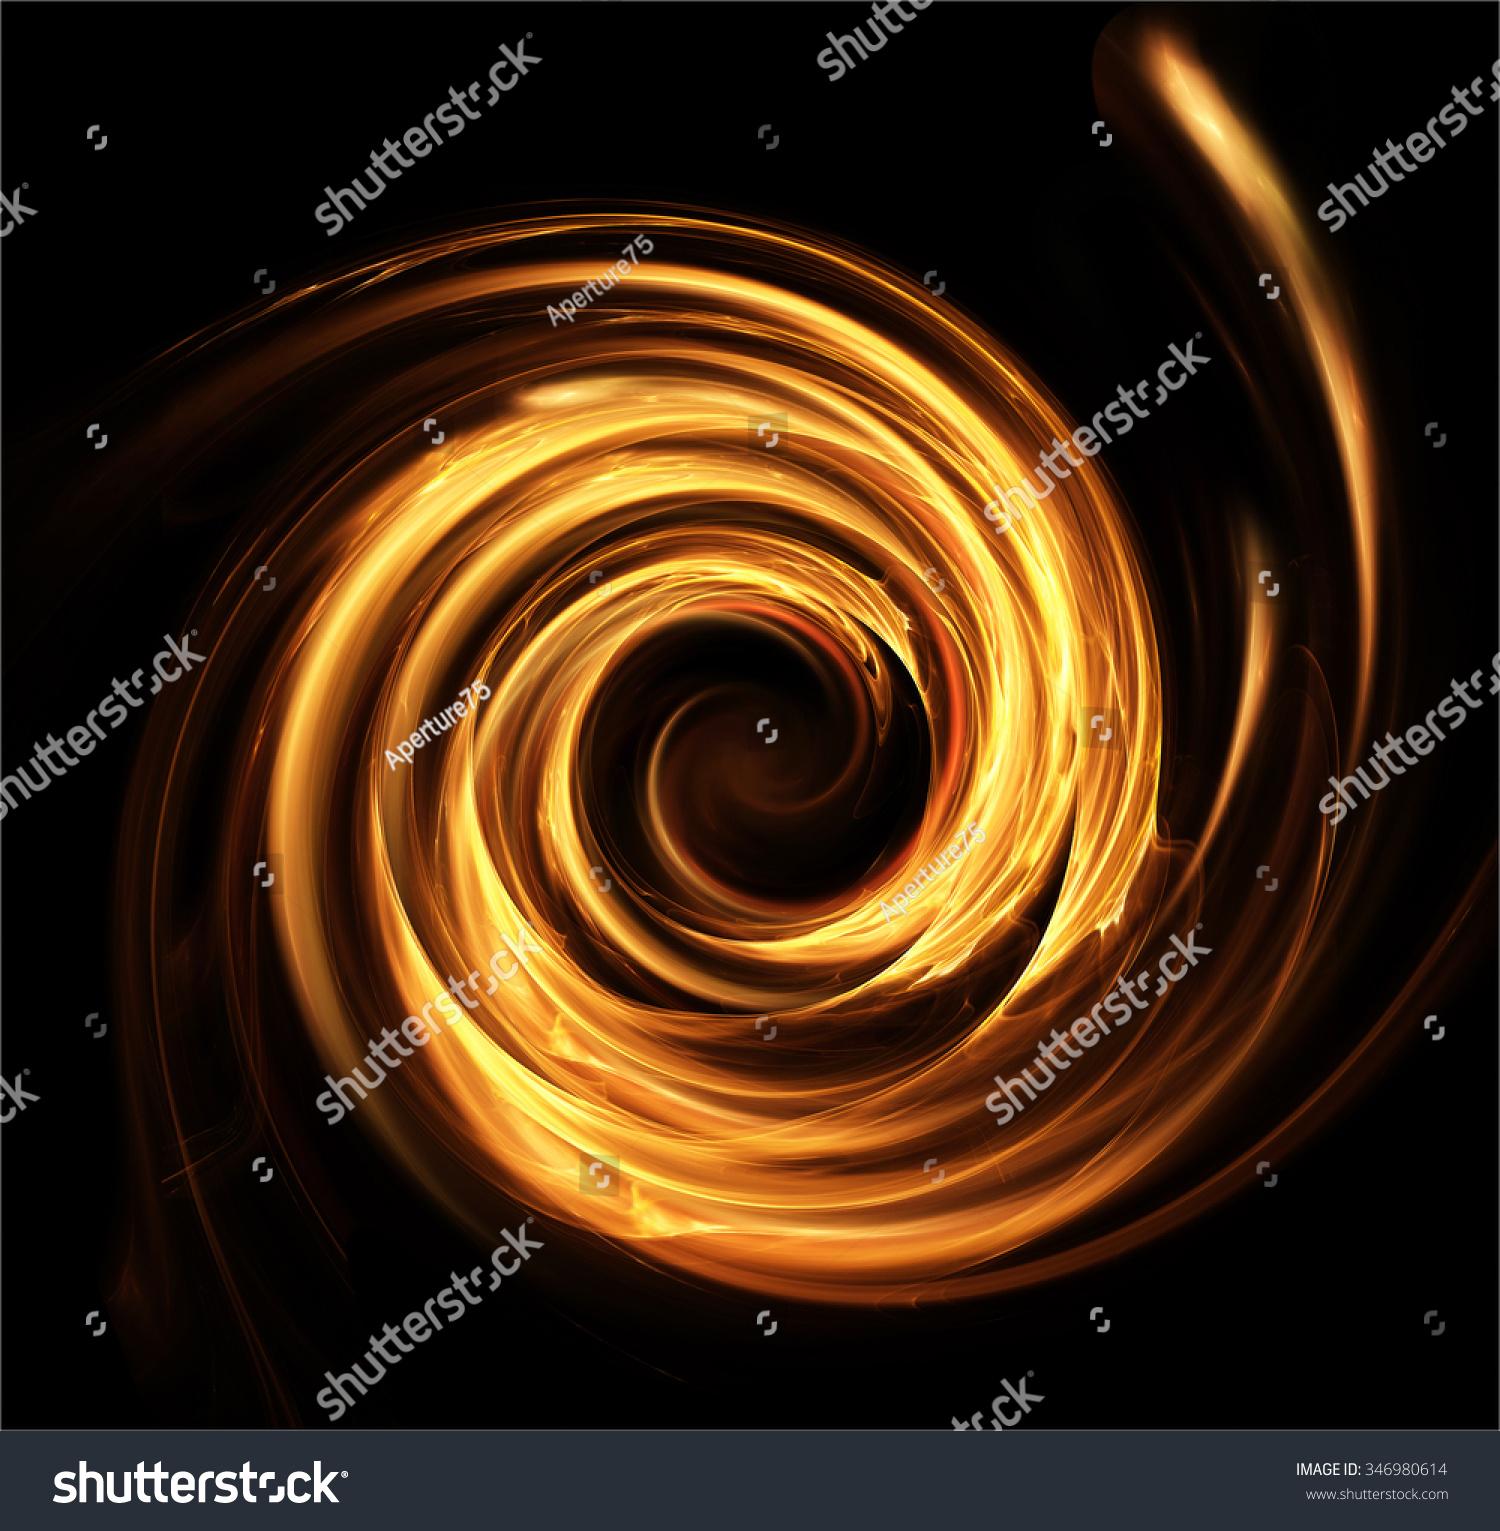 Good Wallpaper Fire Gold - stock-photo-abstract-fire-background-or-fire-wallpaper-346980614  2018_403310 .jpg